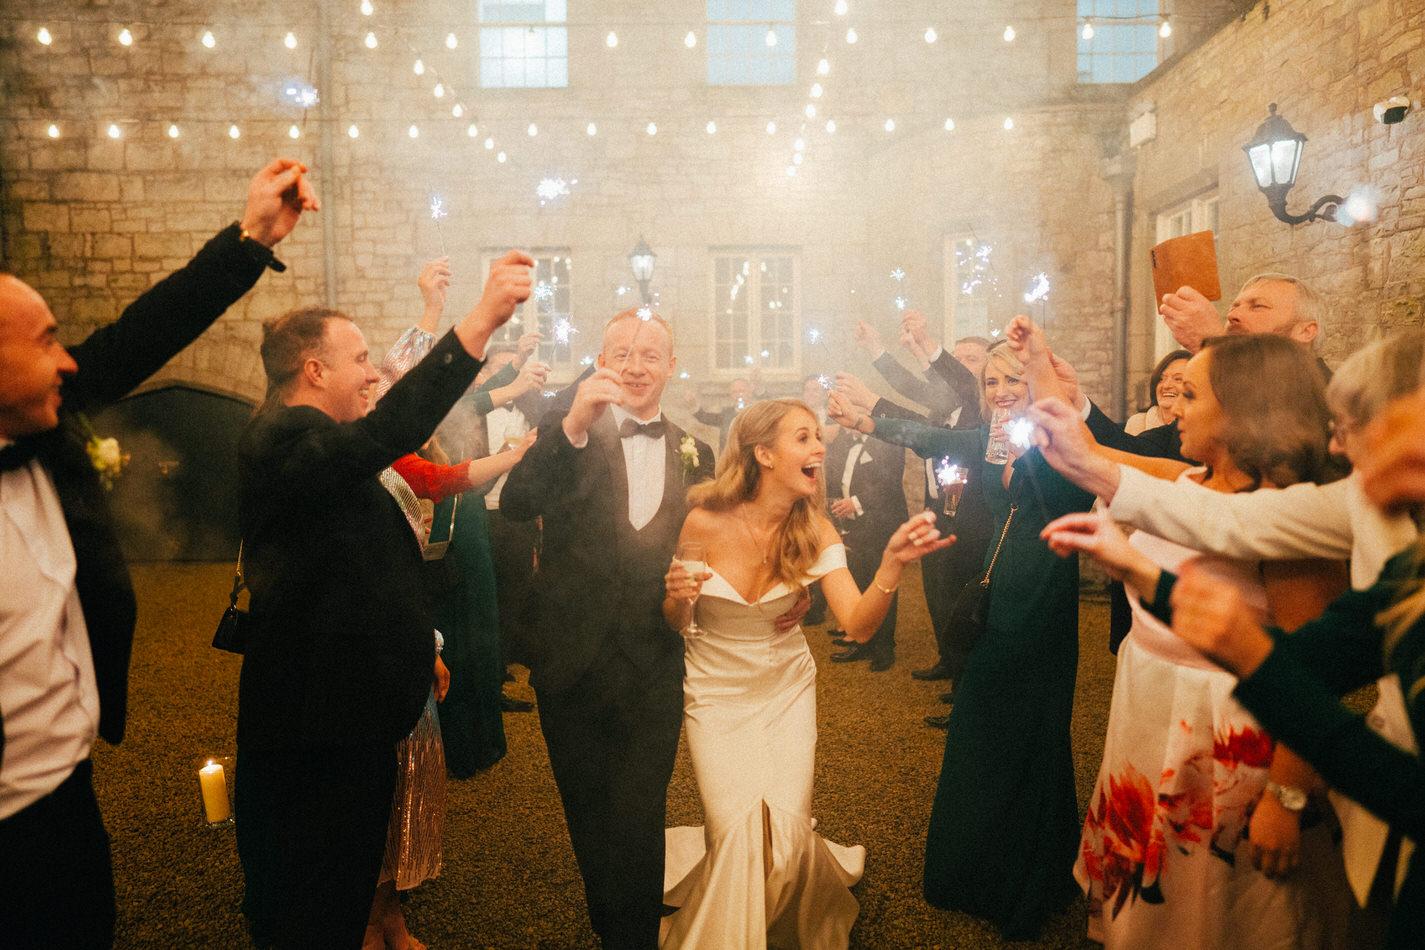 Castle-wedding-ireland-photos- 0344 255